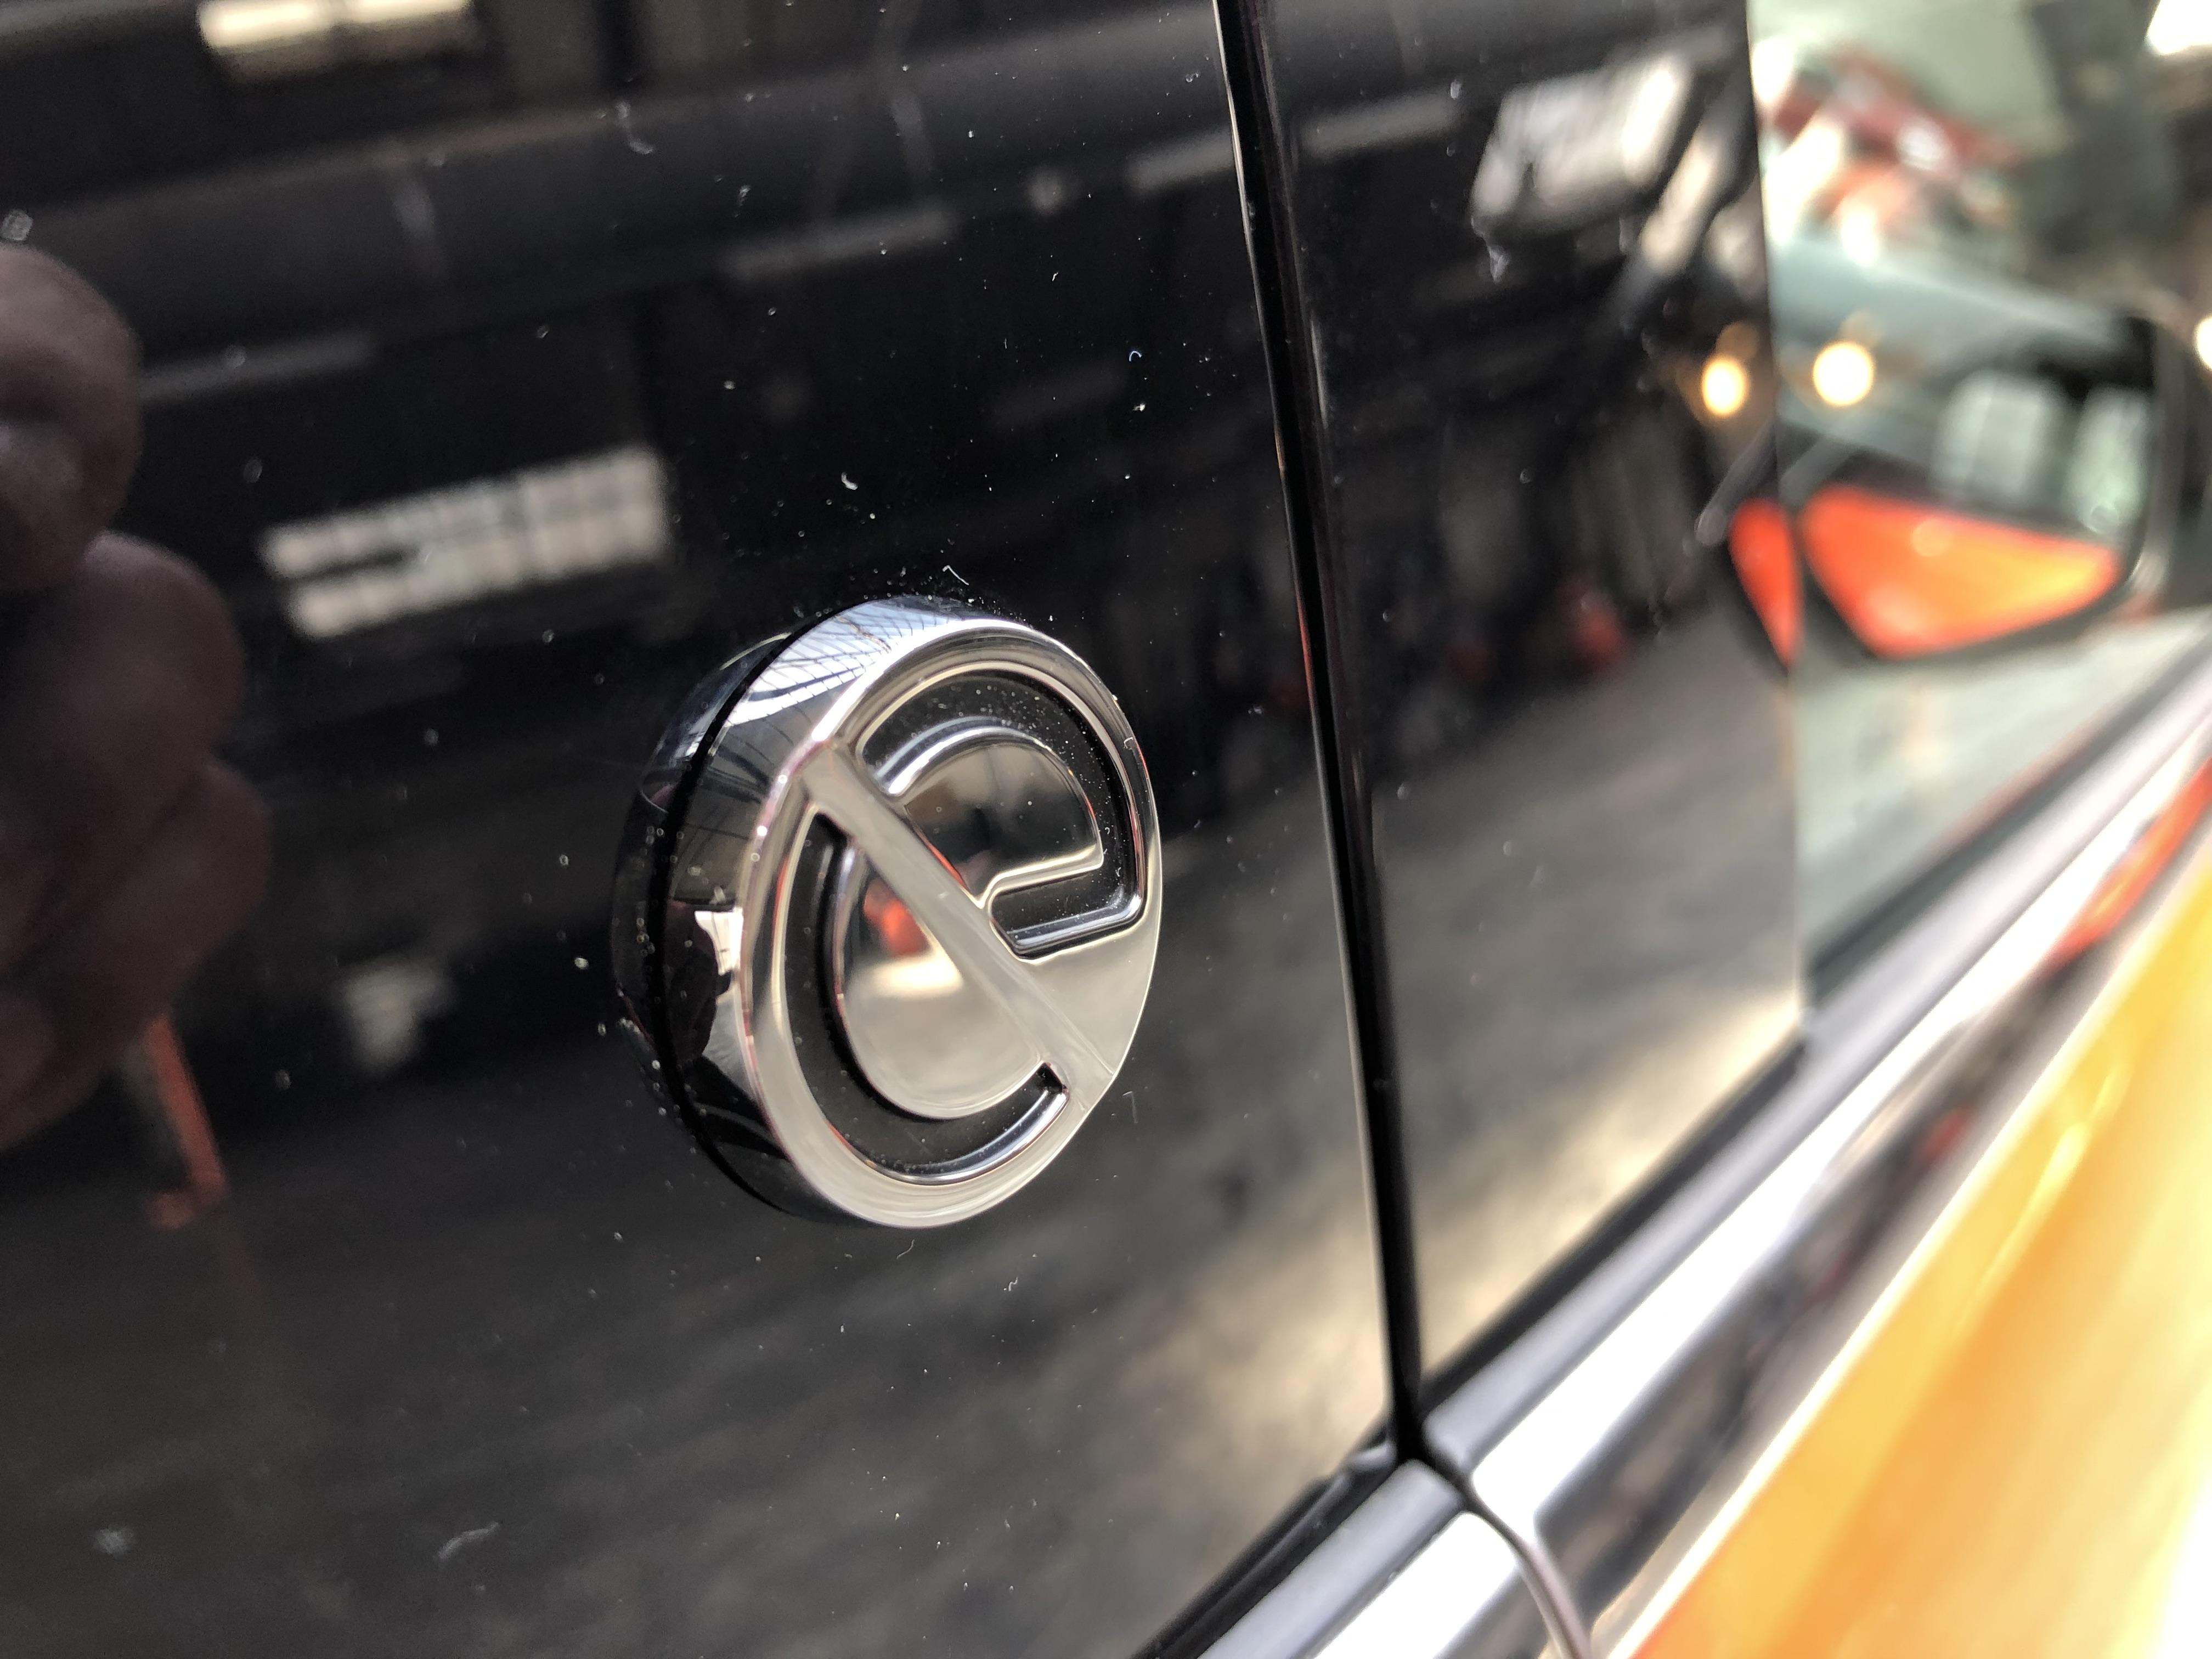 2019 - [Opel] Corsa F [P2JO] - Page 17 S0-opel-corsa-2019-carton-en-vue-presentation-video-601044